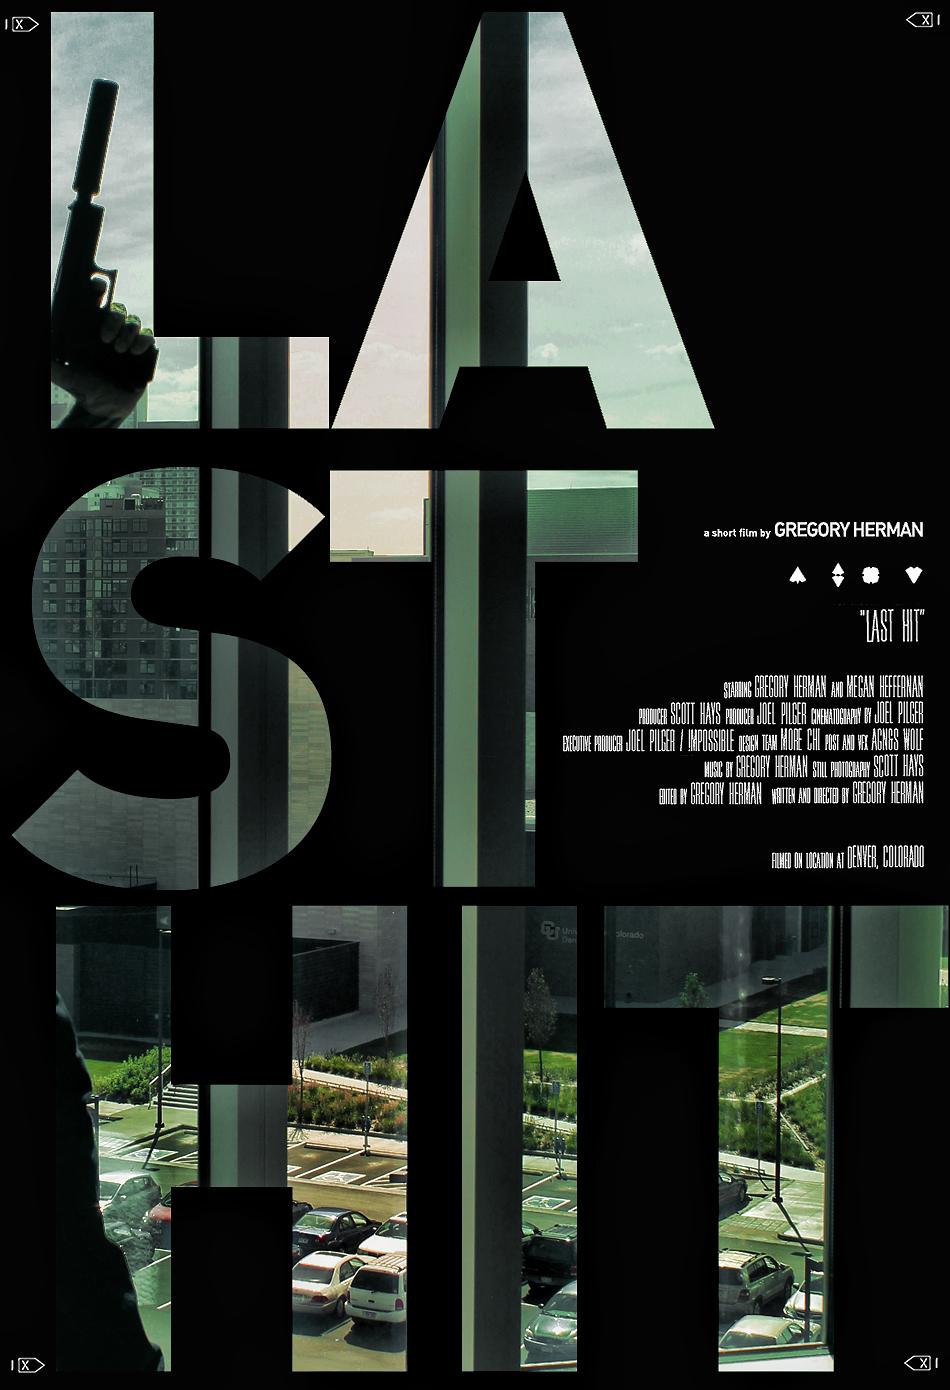 LAST_HIT_Poster_9.jpg